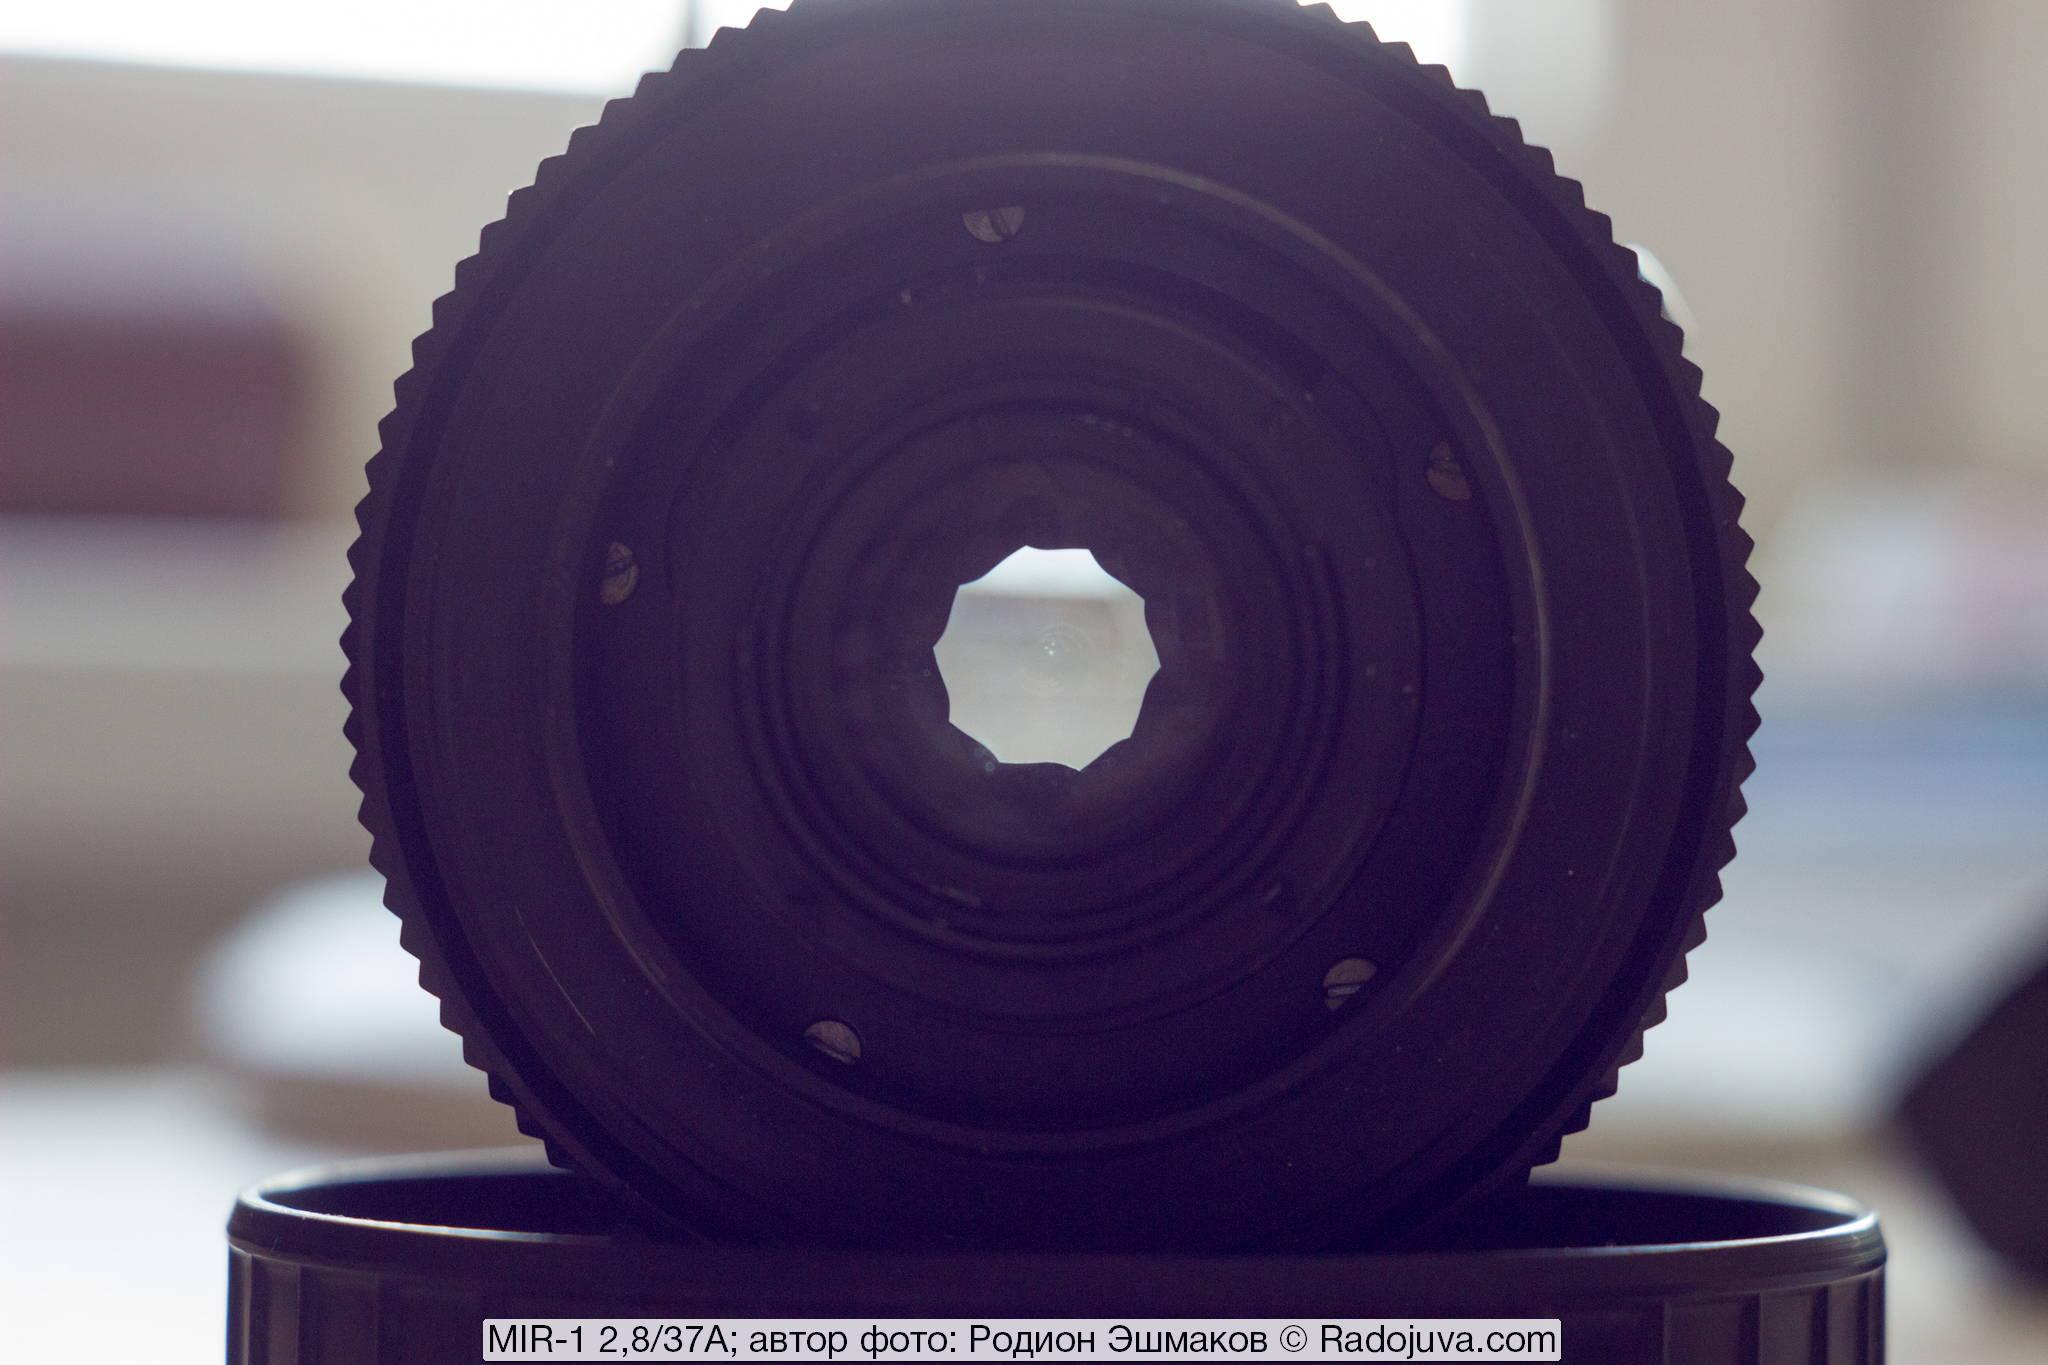 Форма диафрагмы Мир-1 на F/5.6